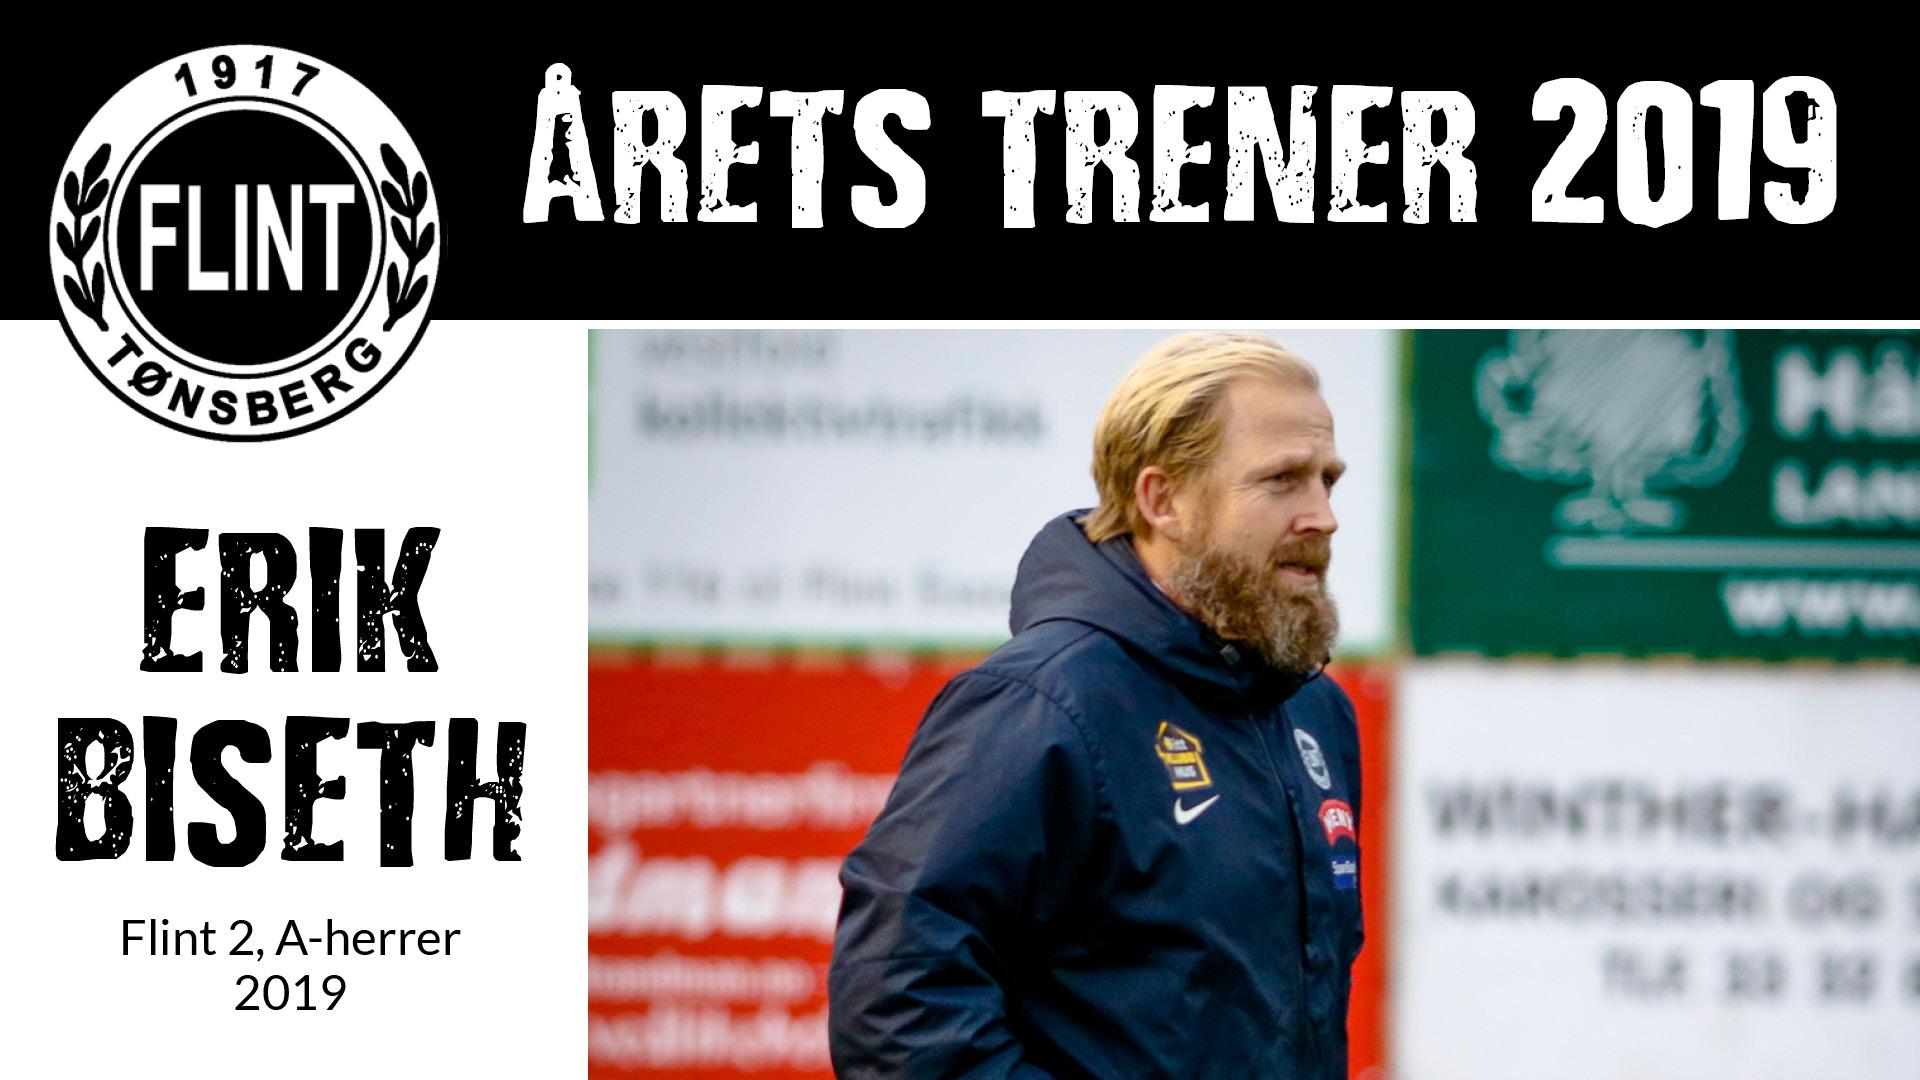 https://www.flintfotball.no/wp-content/uploads/2020/05/Årets-Trener.jpg